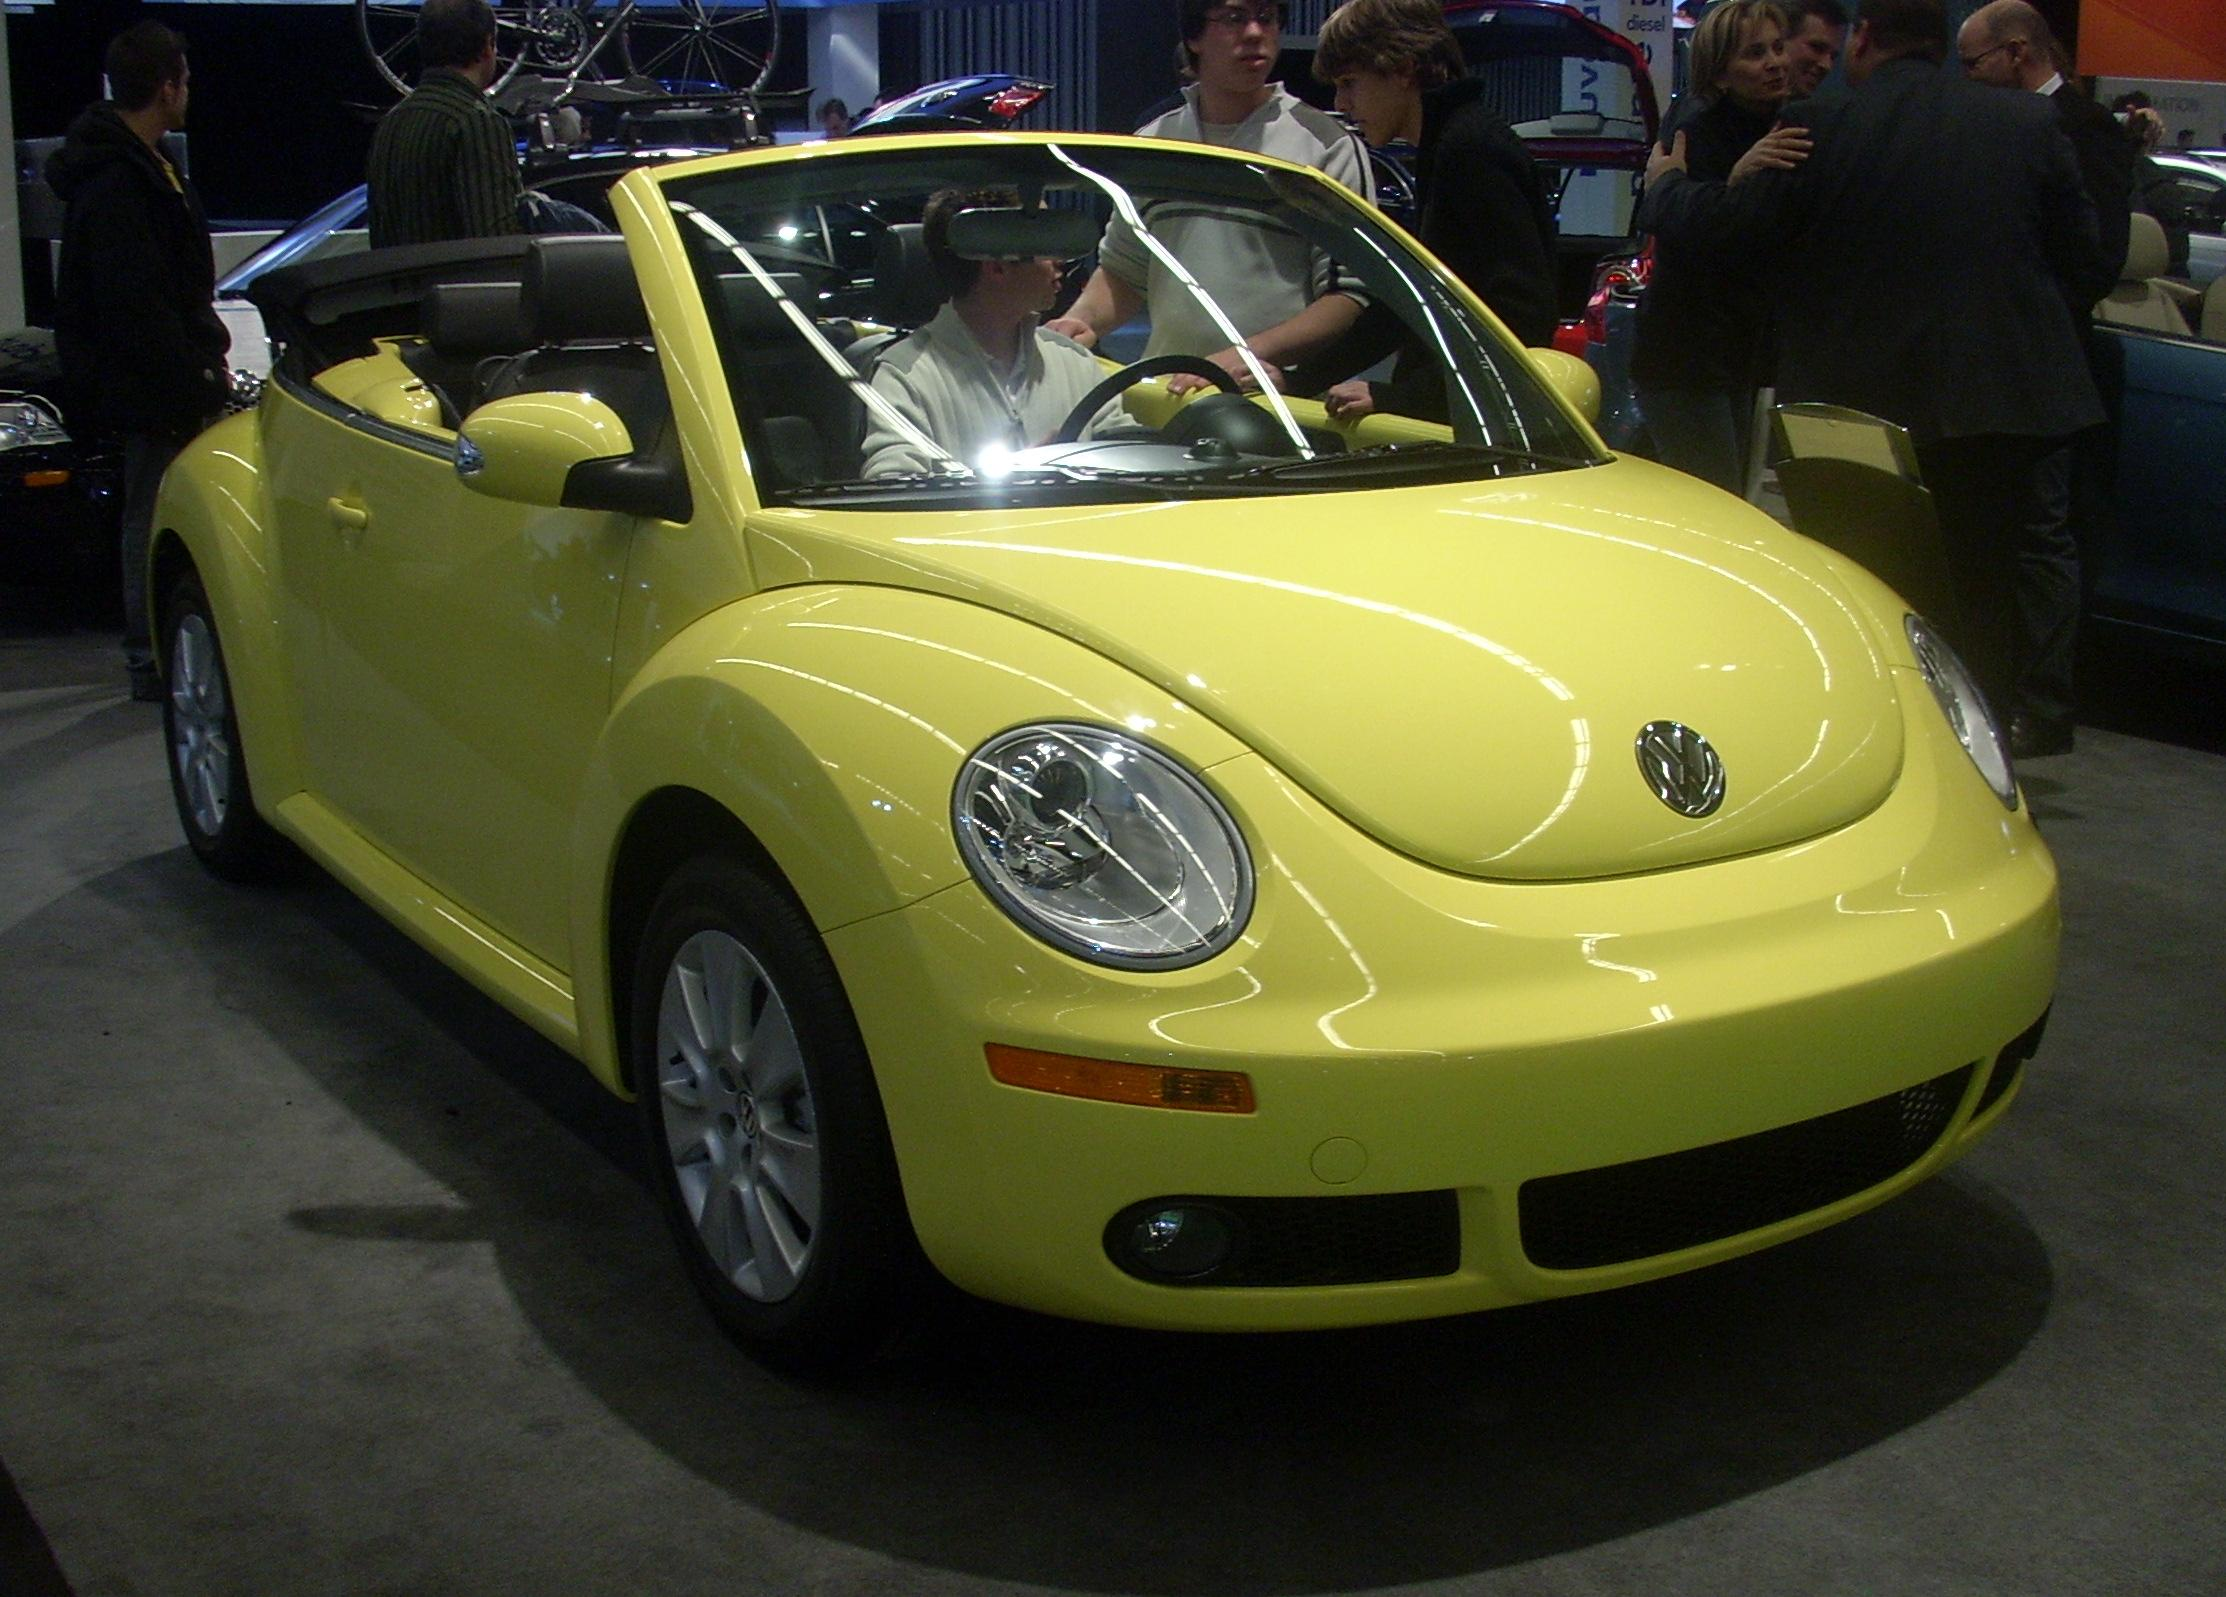 file 39 08 volkswagen new beetle convertible montreal jpg wikimedia commons. Black Bedroom Furniture Sets. Home Design Ideas